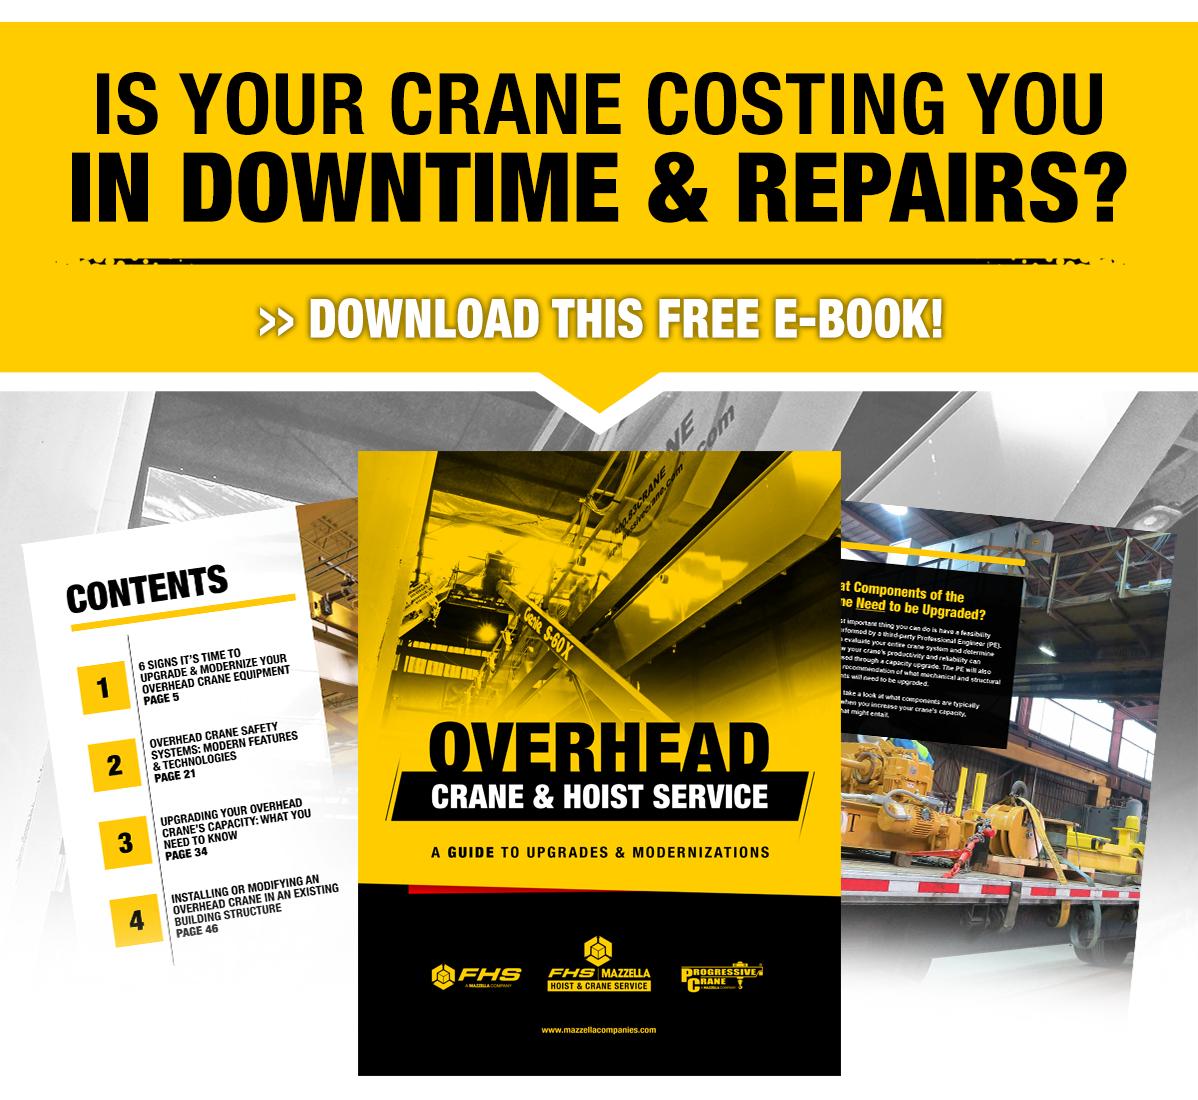 overhead crane upgrades and modernization e-book